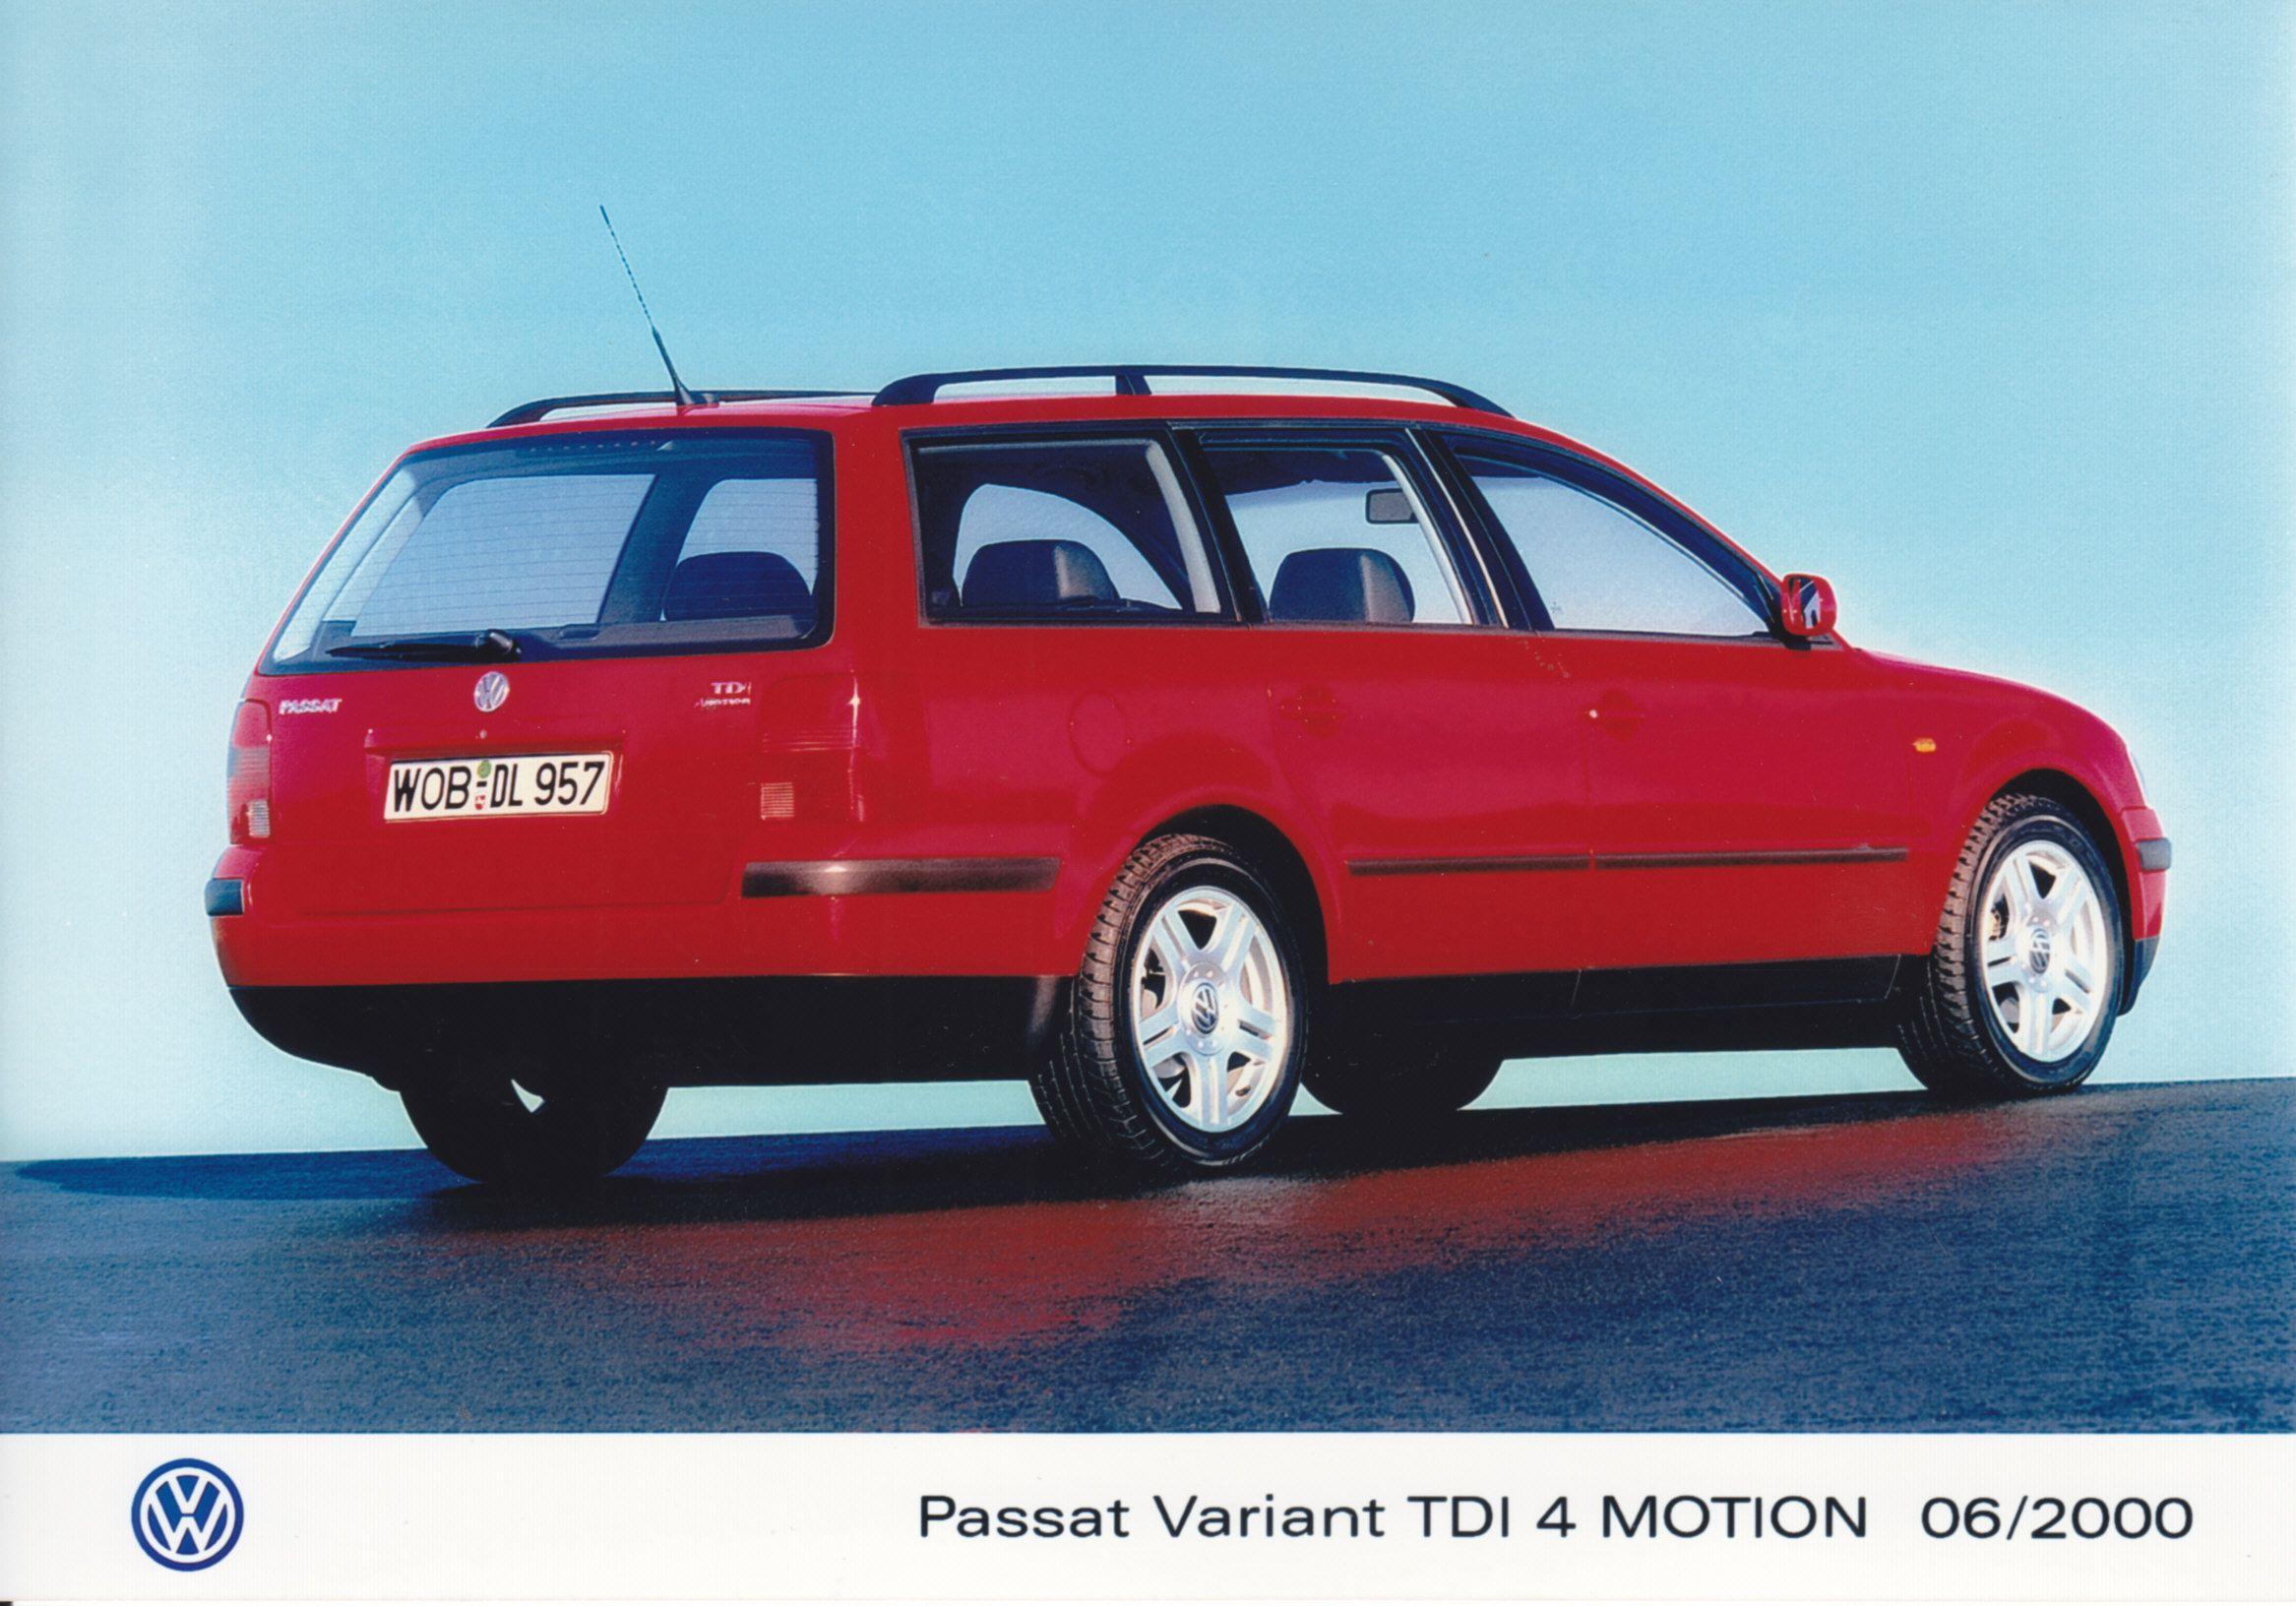 Volkswagen Passat Variant TDI 4Motion (06/2000, Italian